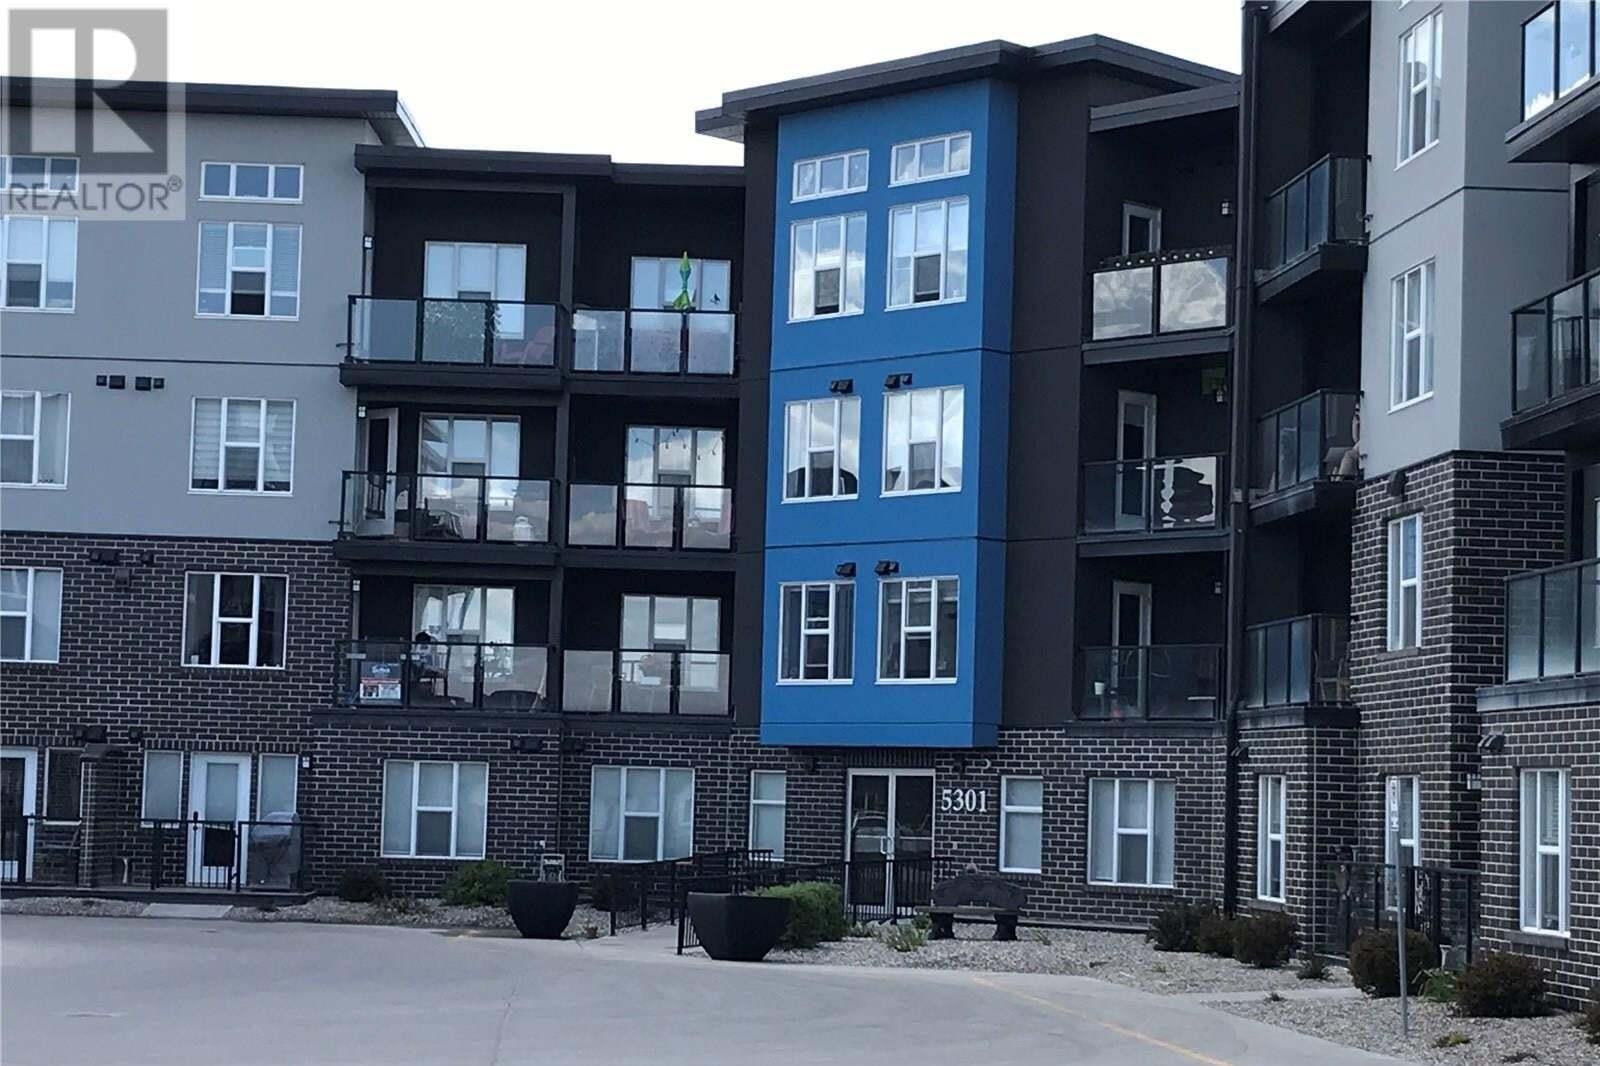 Condo for sale at 5301 Universal Cres Unit 424 Regina Saskatchewan - MLS: SK809853